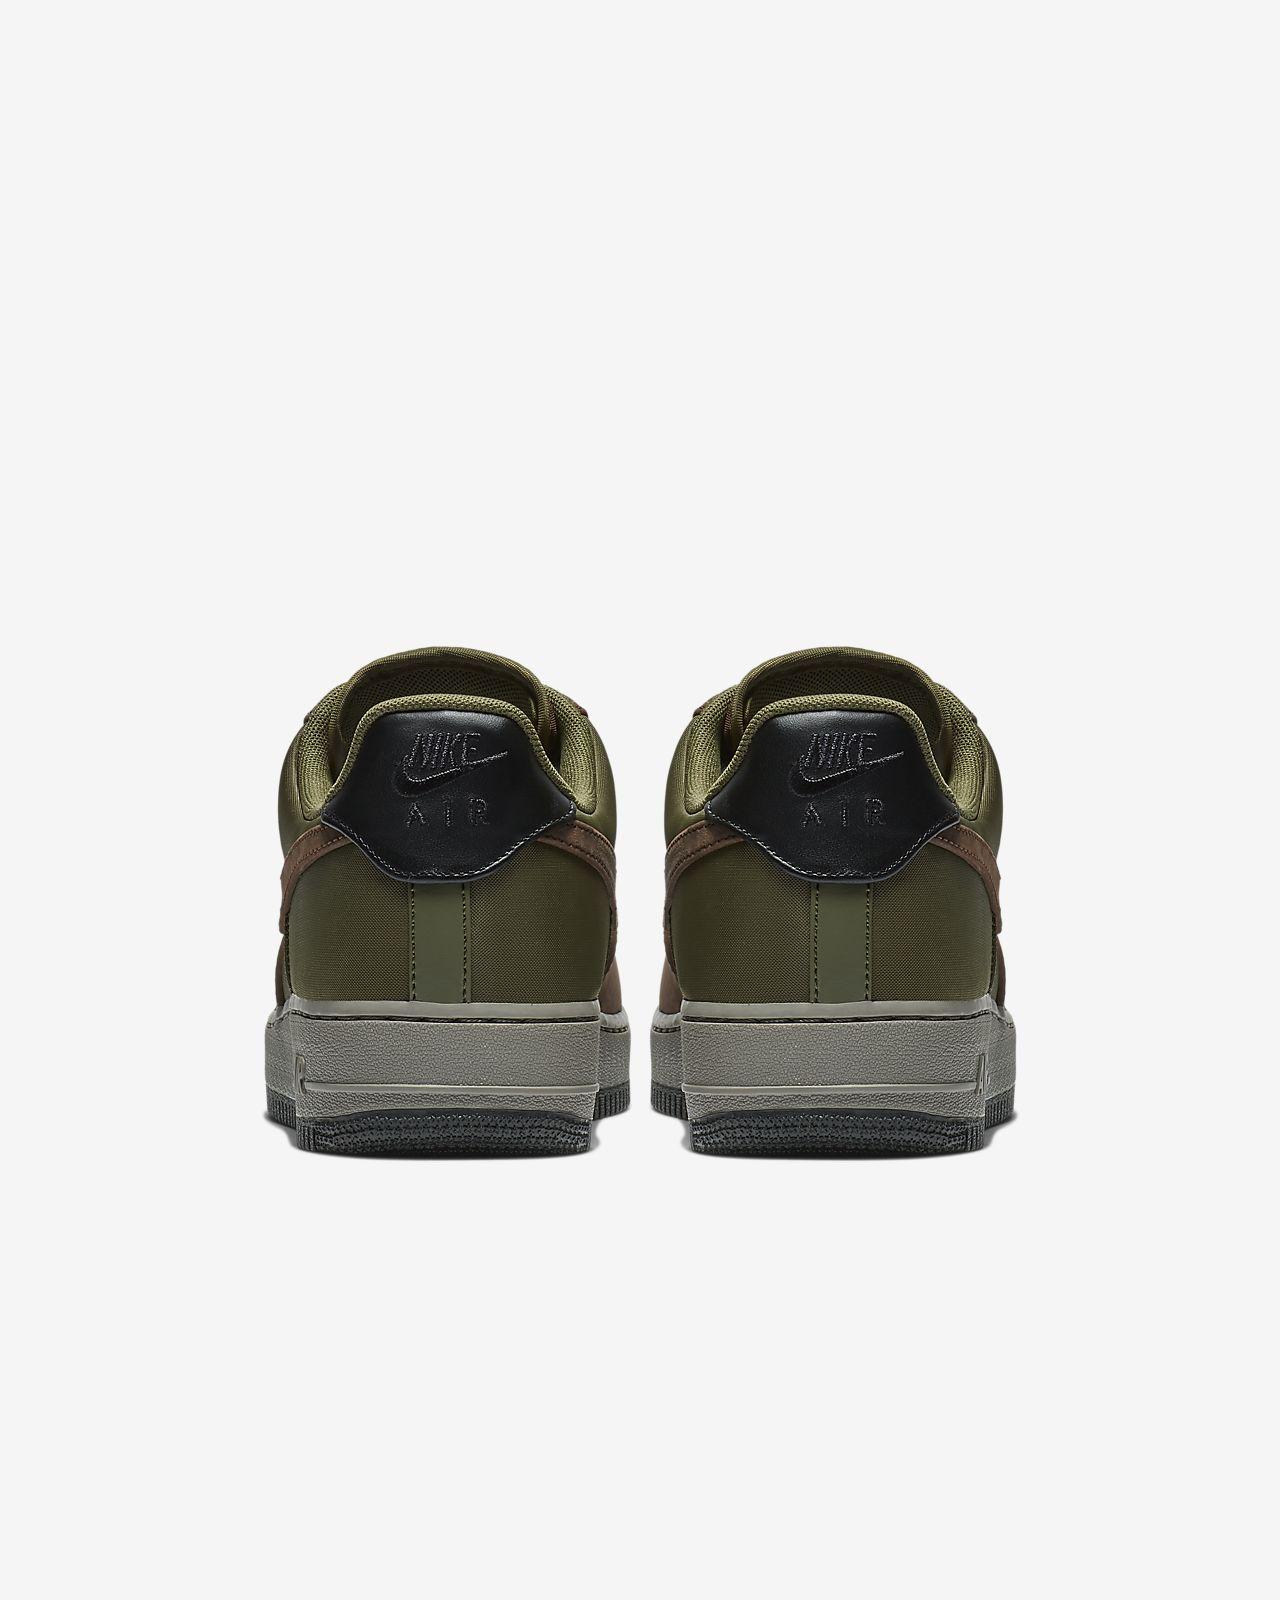 new arrival b100a 08132 ... Nike Air Force 1  07 Premier